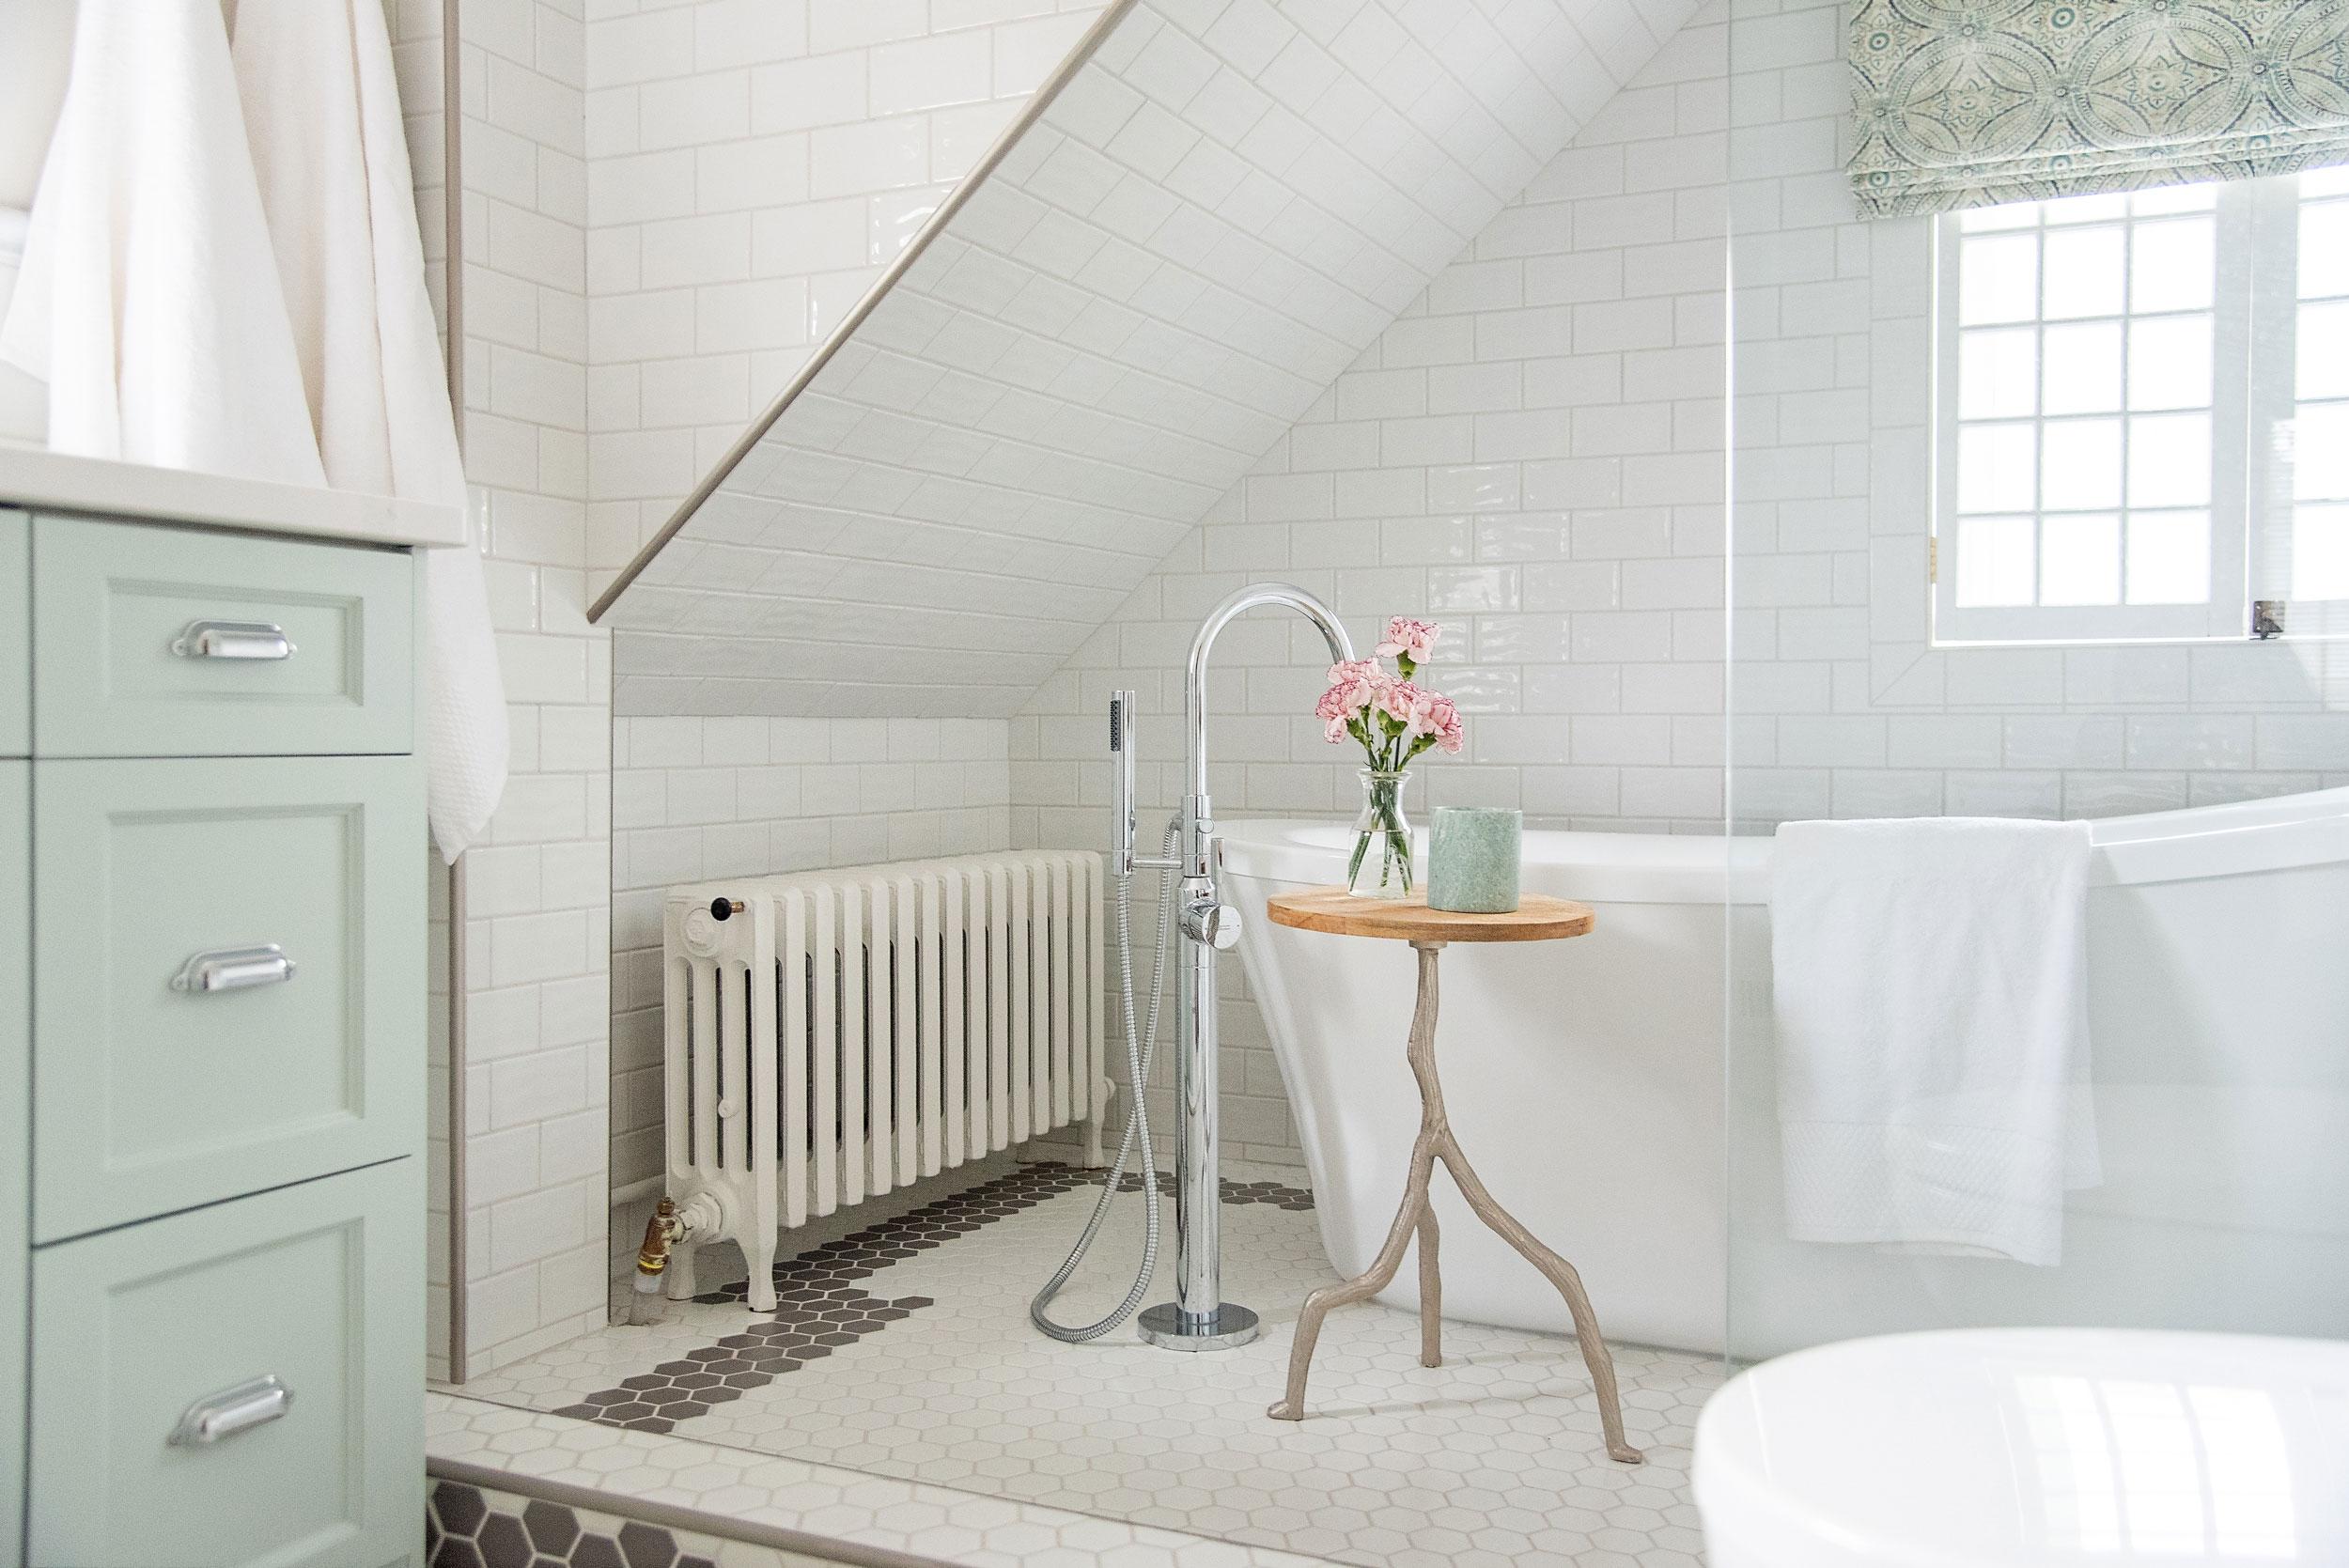 Farmer's Daughter Interiors - Century Bath Remodel